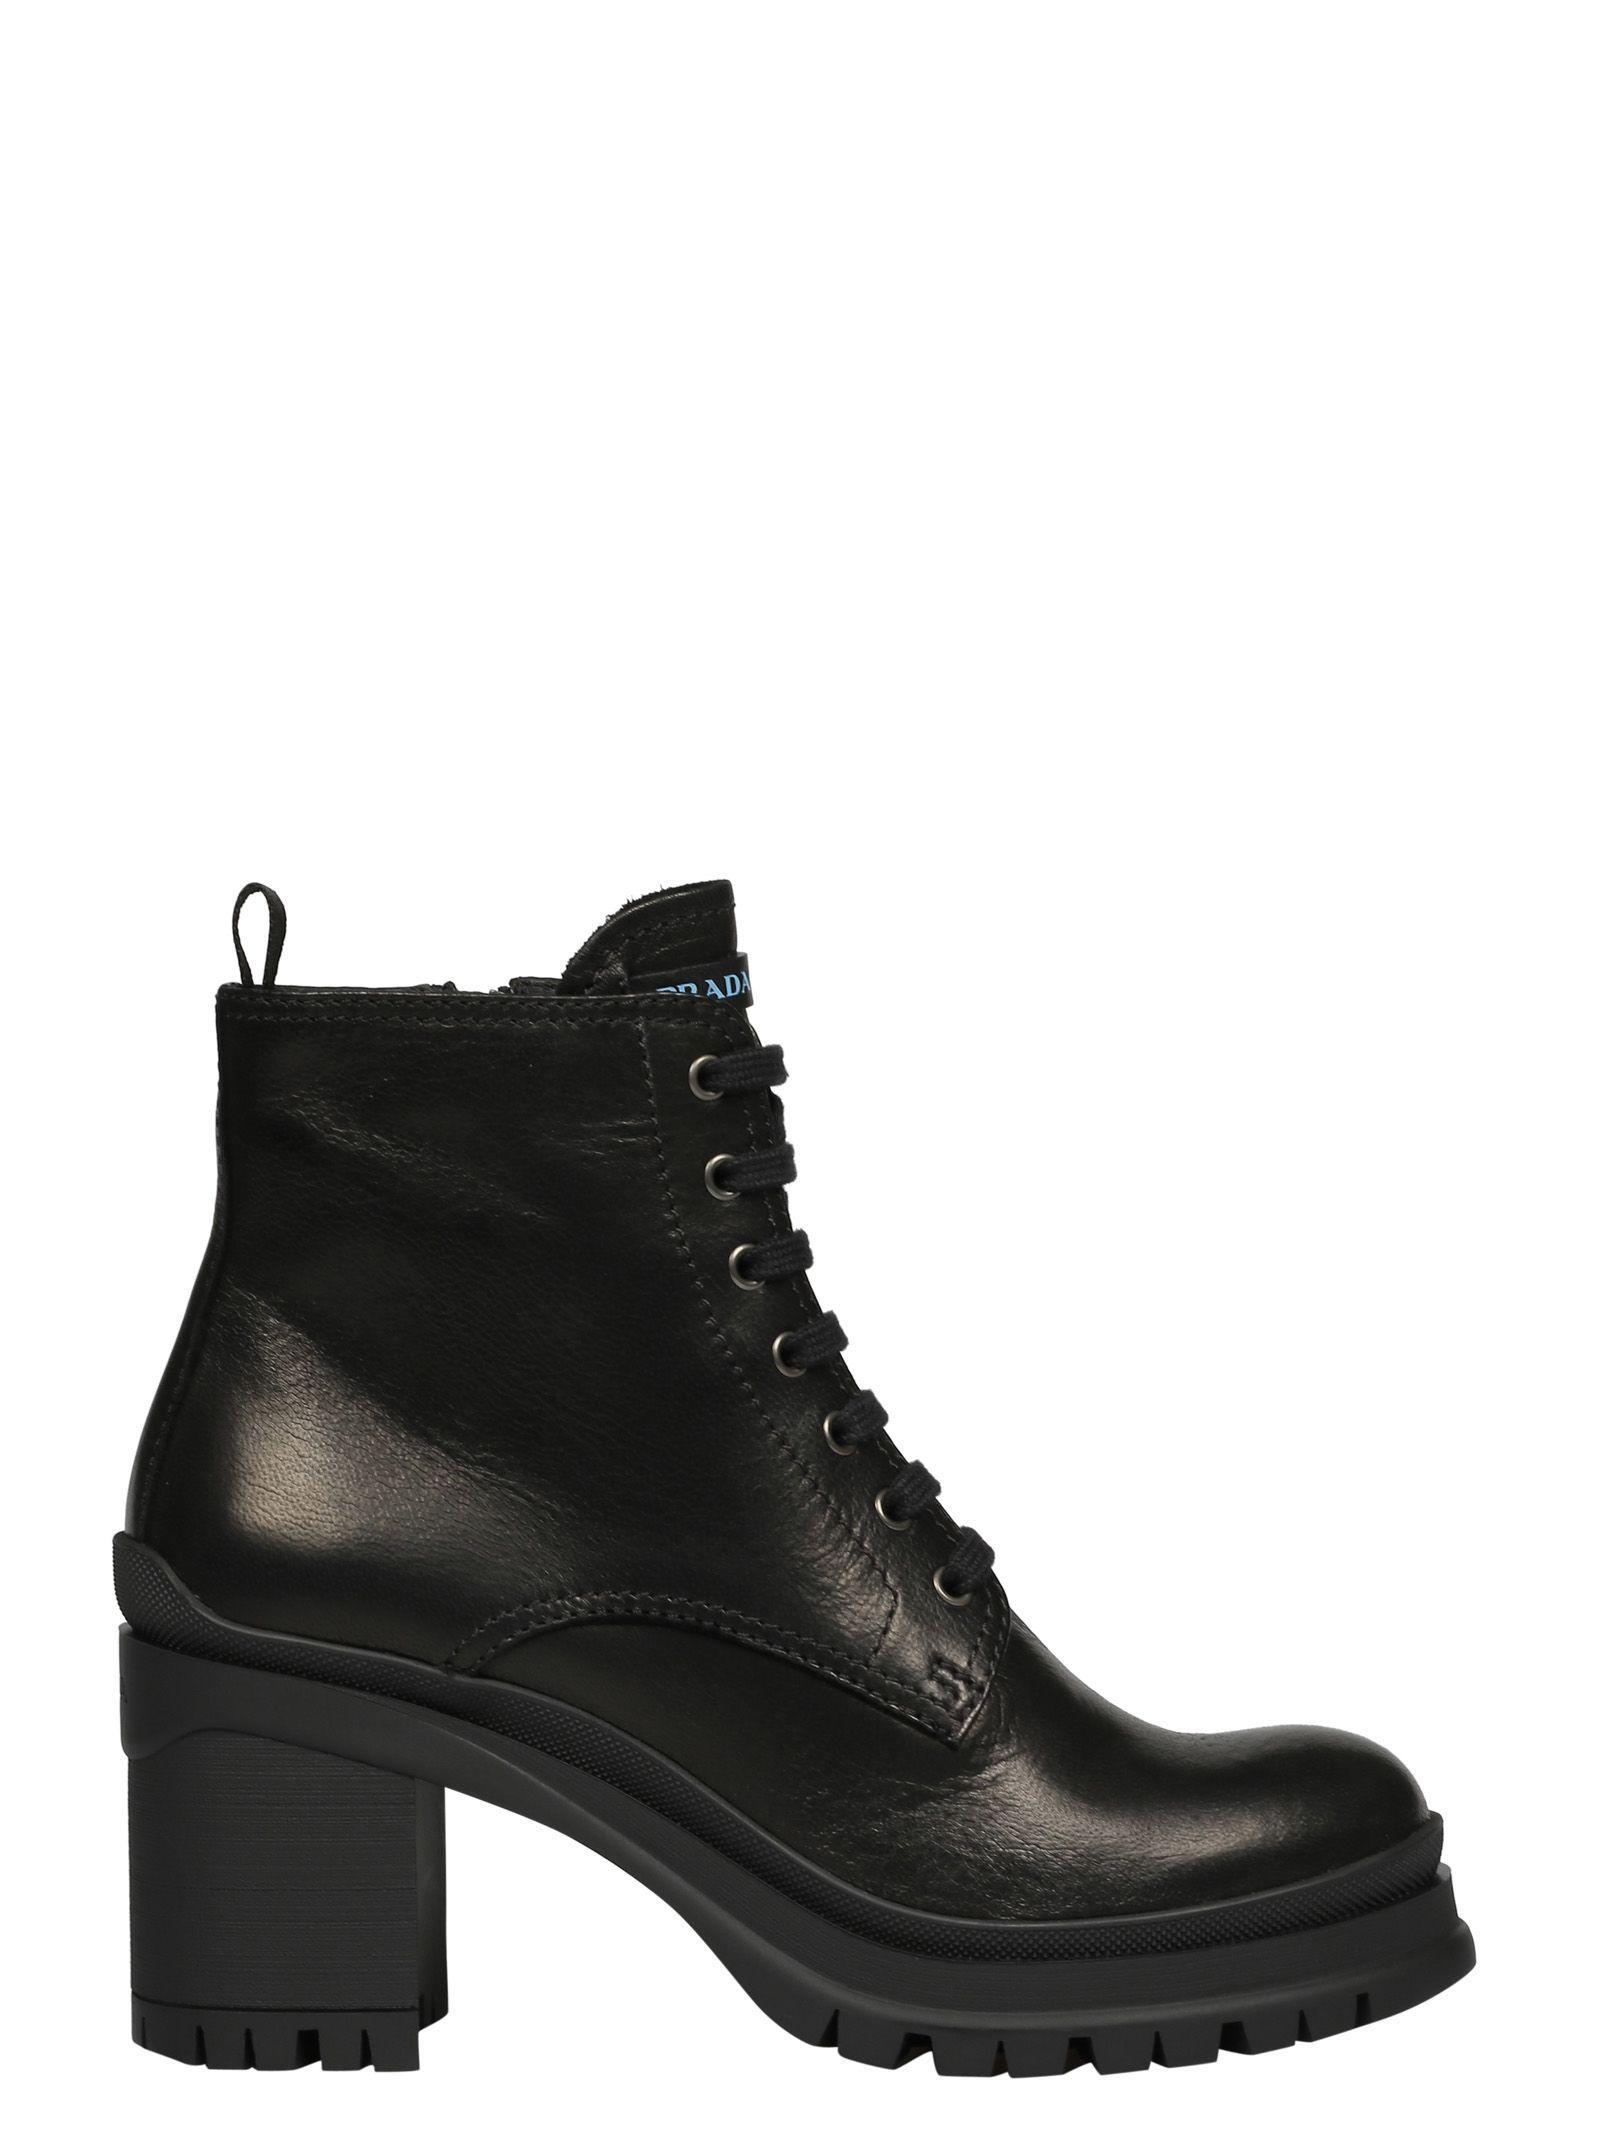 b4932c66c5 Prada Block Heel Lace-Up Boots In Black | ModeSens